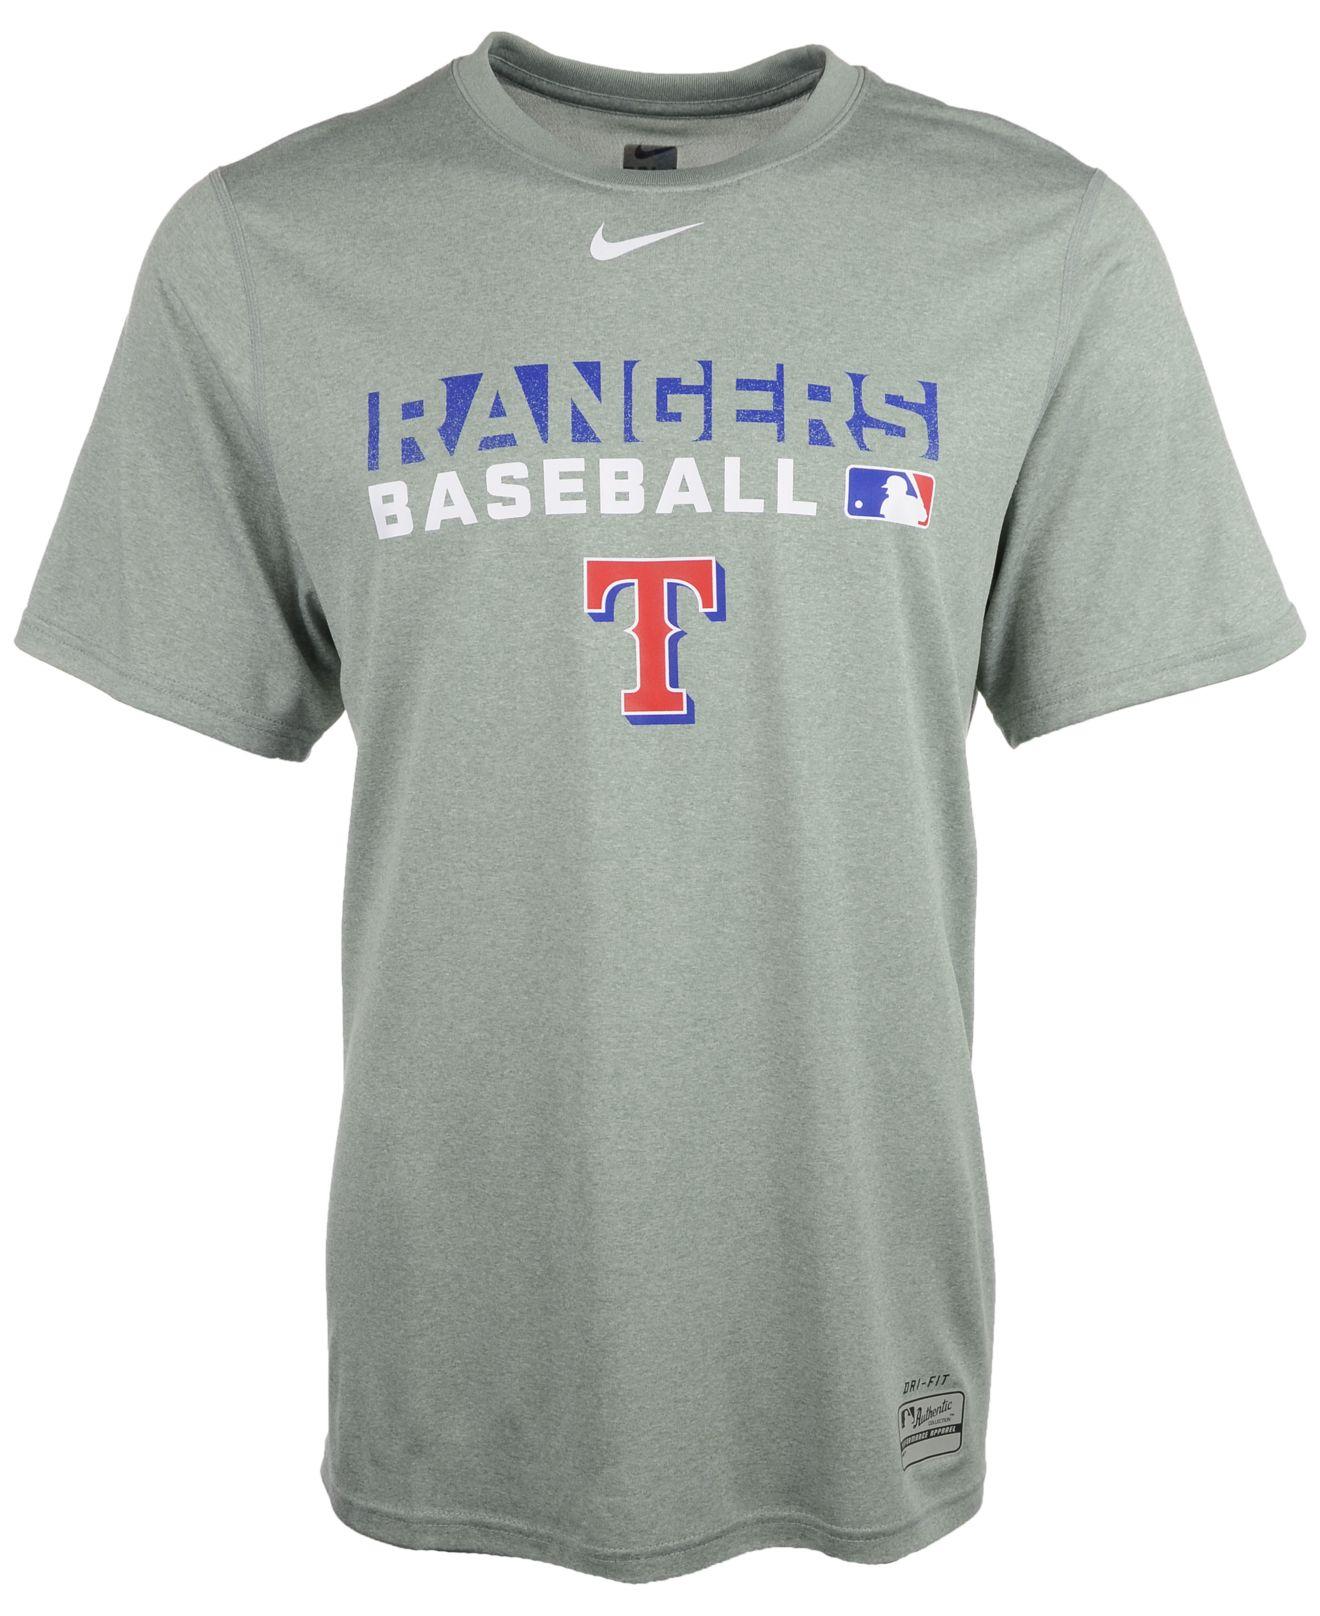 5856a97ba12 Texas Ranger T Shirts Sale   RLDM